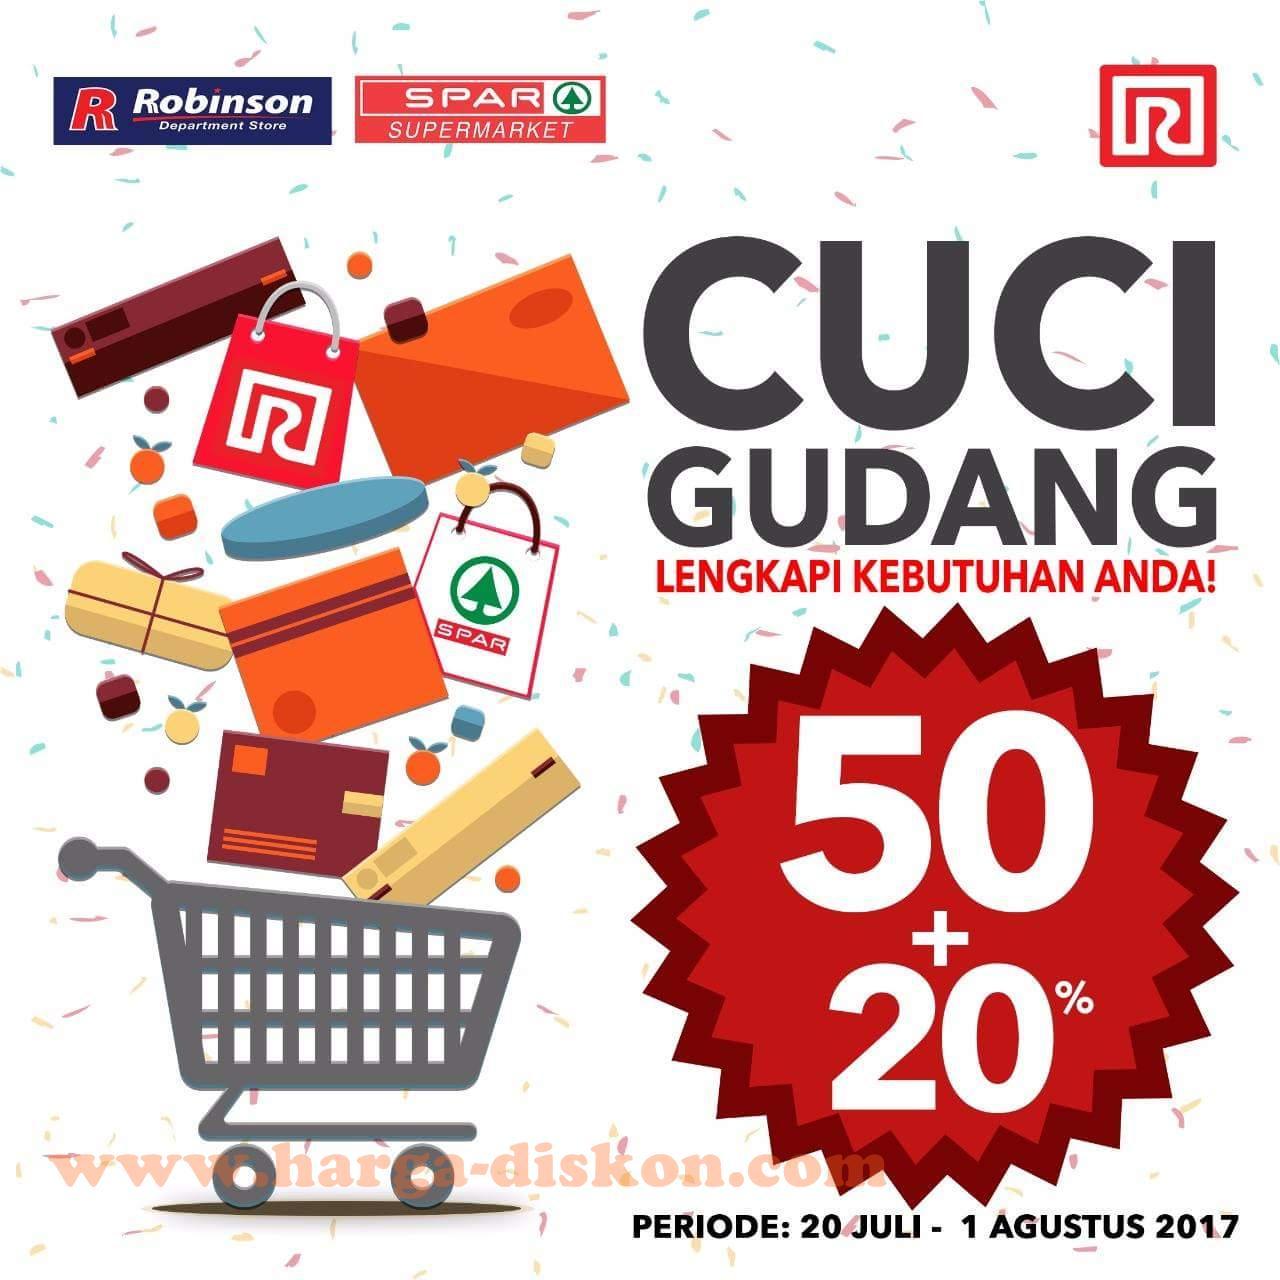 Promo Ramayana Robinson Dan Spar Cuci Gudang Periode 20 Juli 01